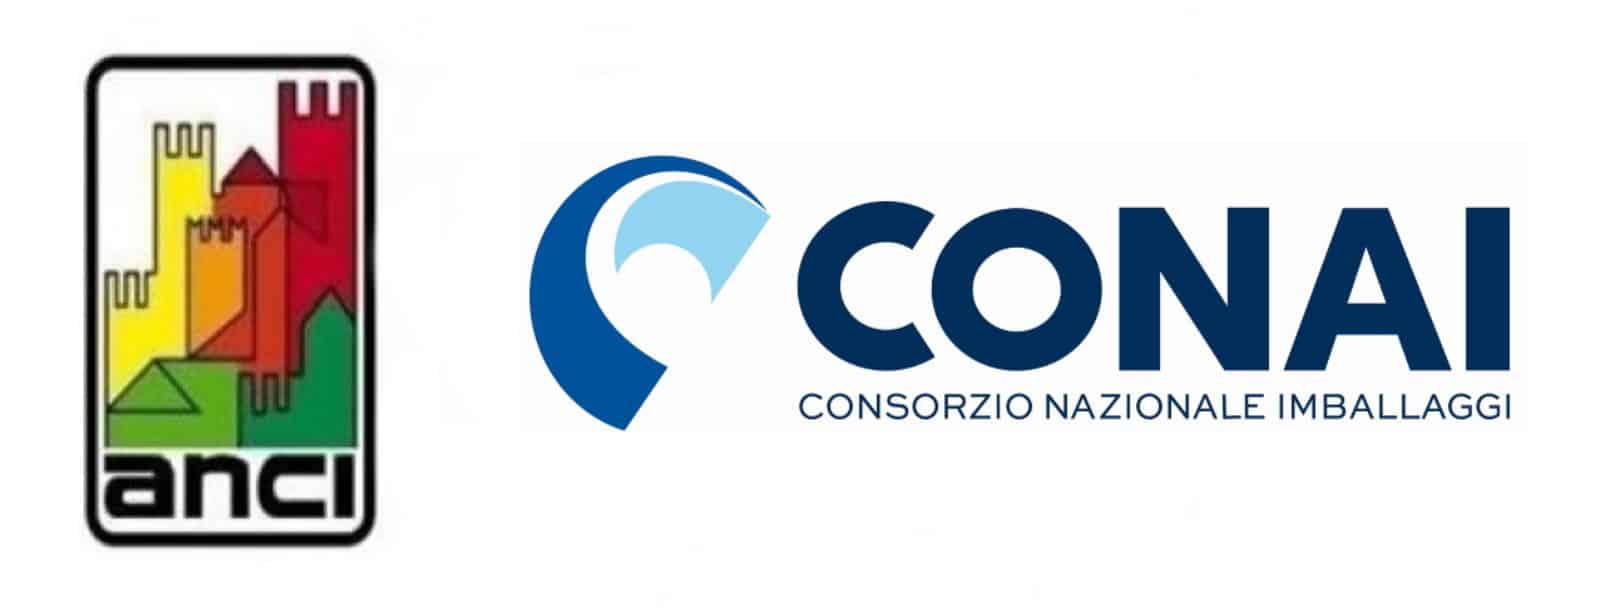 ANCI-CONAI